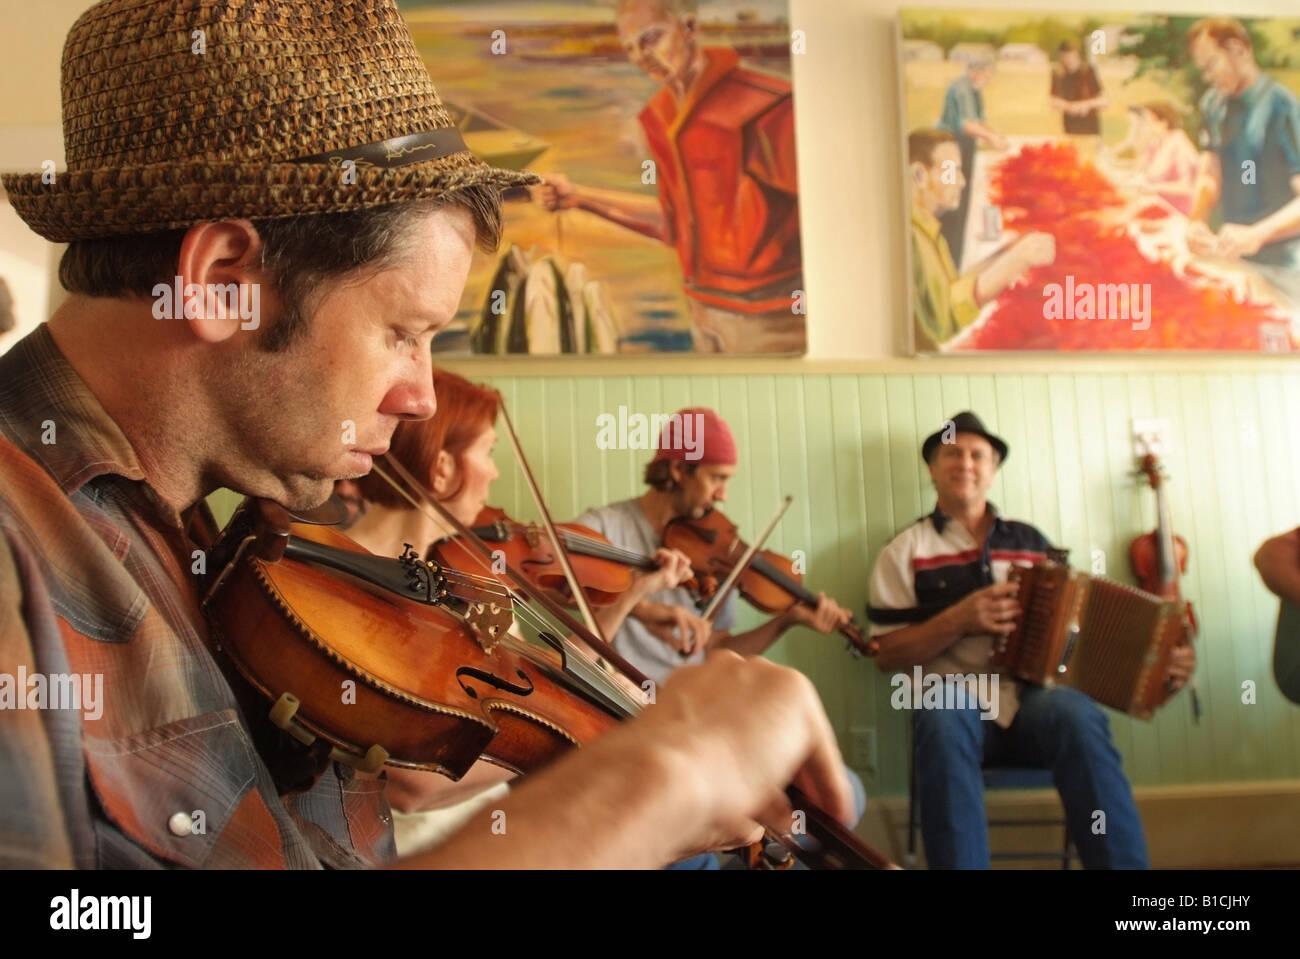 usa-louisiana-la-cajun-country-breaux-bridge-cajun-music-jam-session-B1CJHY.jpg